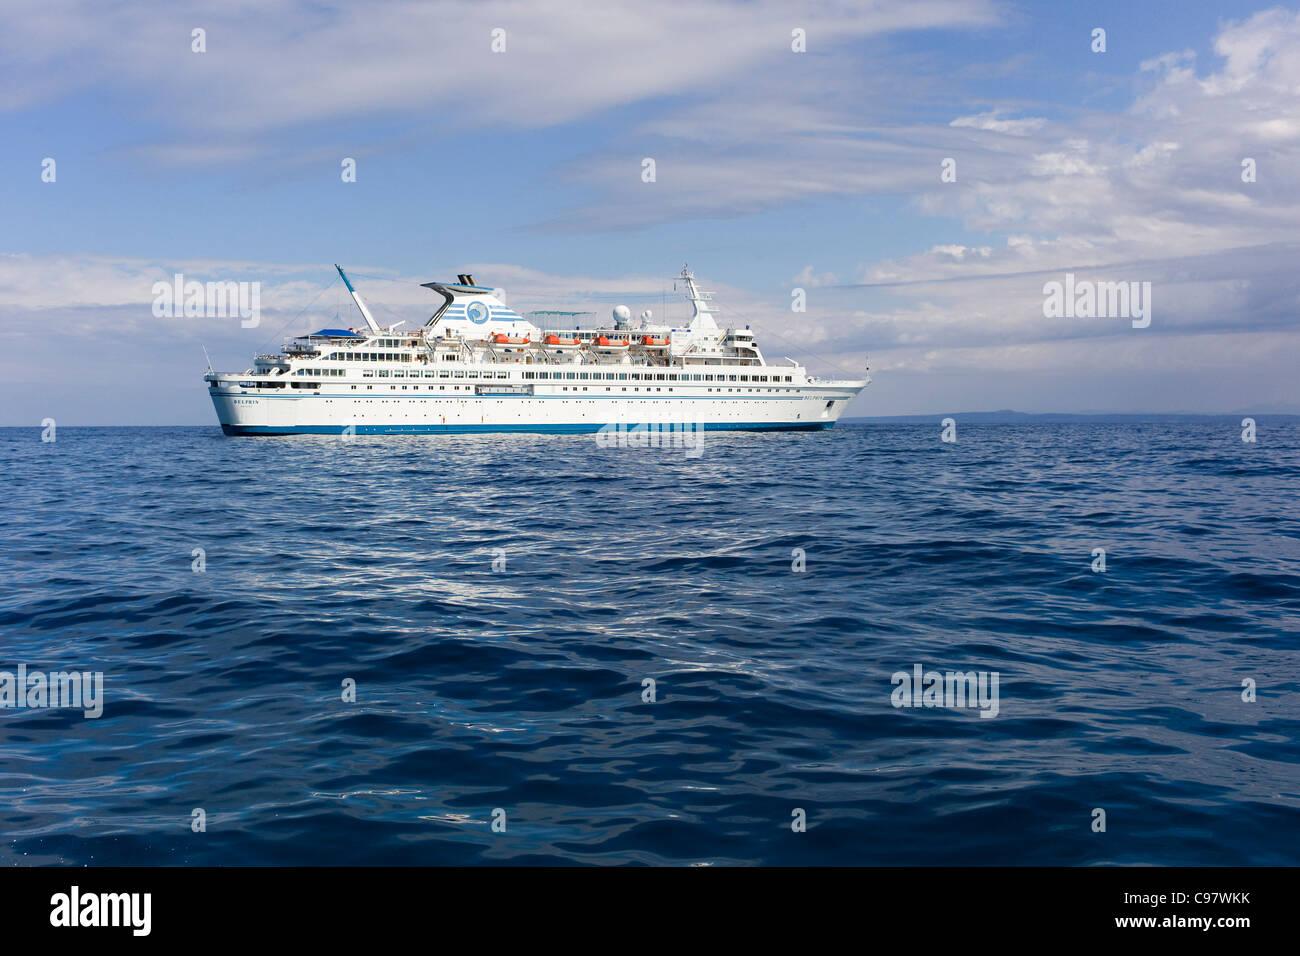 Cruiseship MS Delphin, Aegean Sea, near Greece, Europe - Stock Image